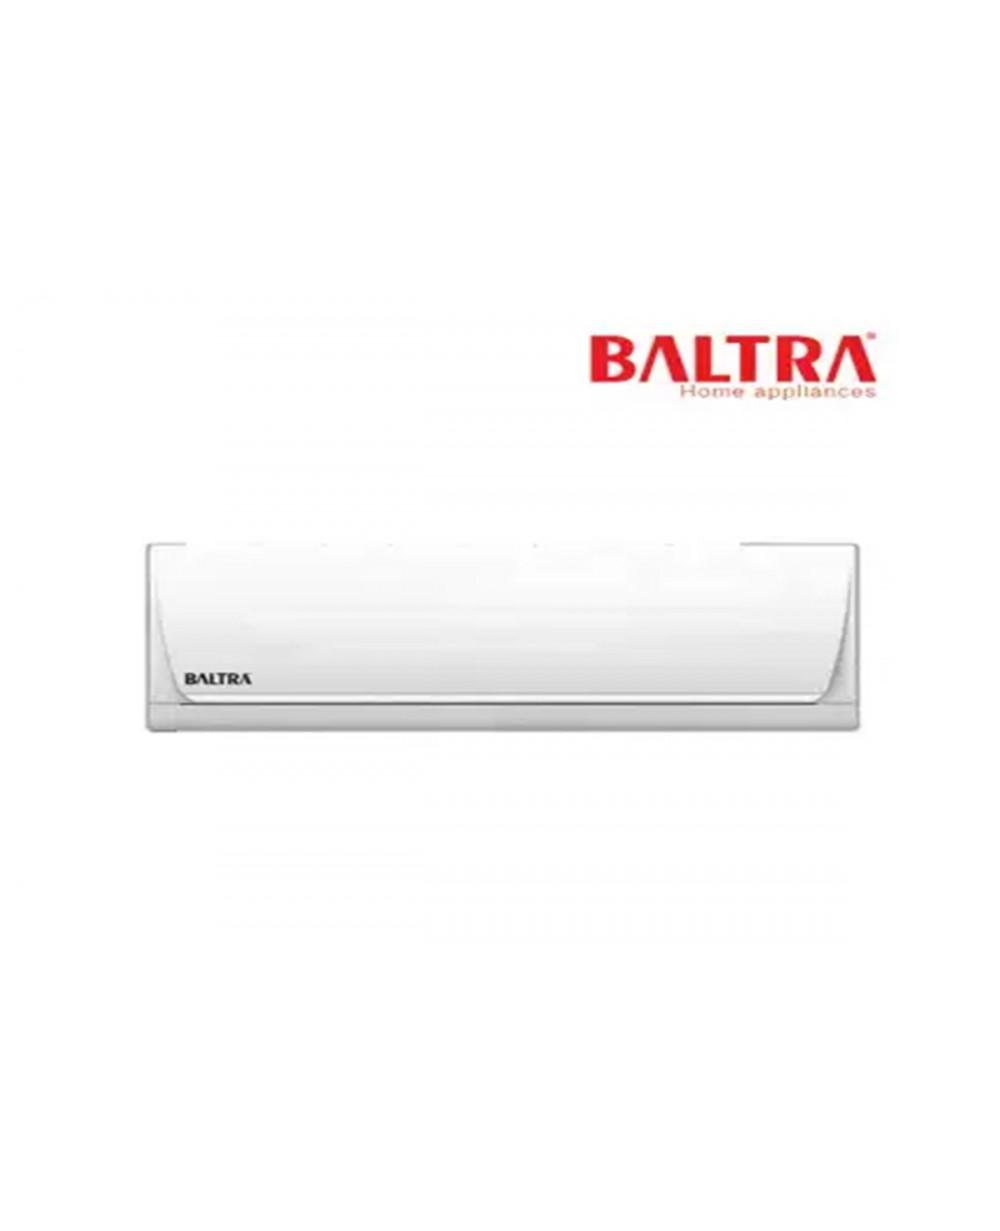 Baltra 1.0 Ton Air Conditioner White -  BAC100SP14718